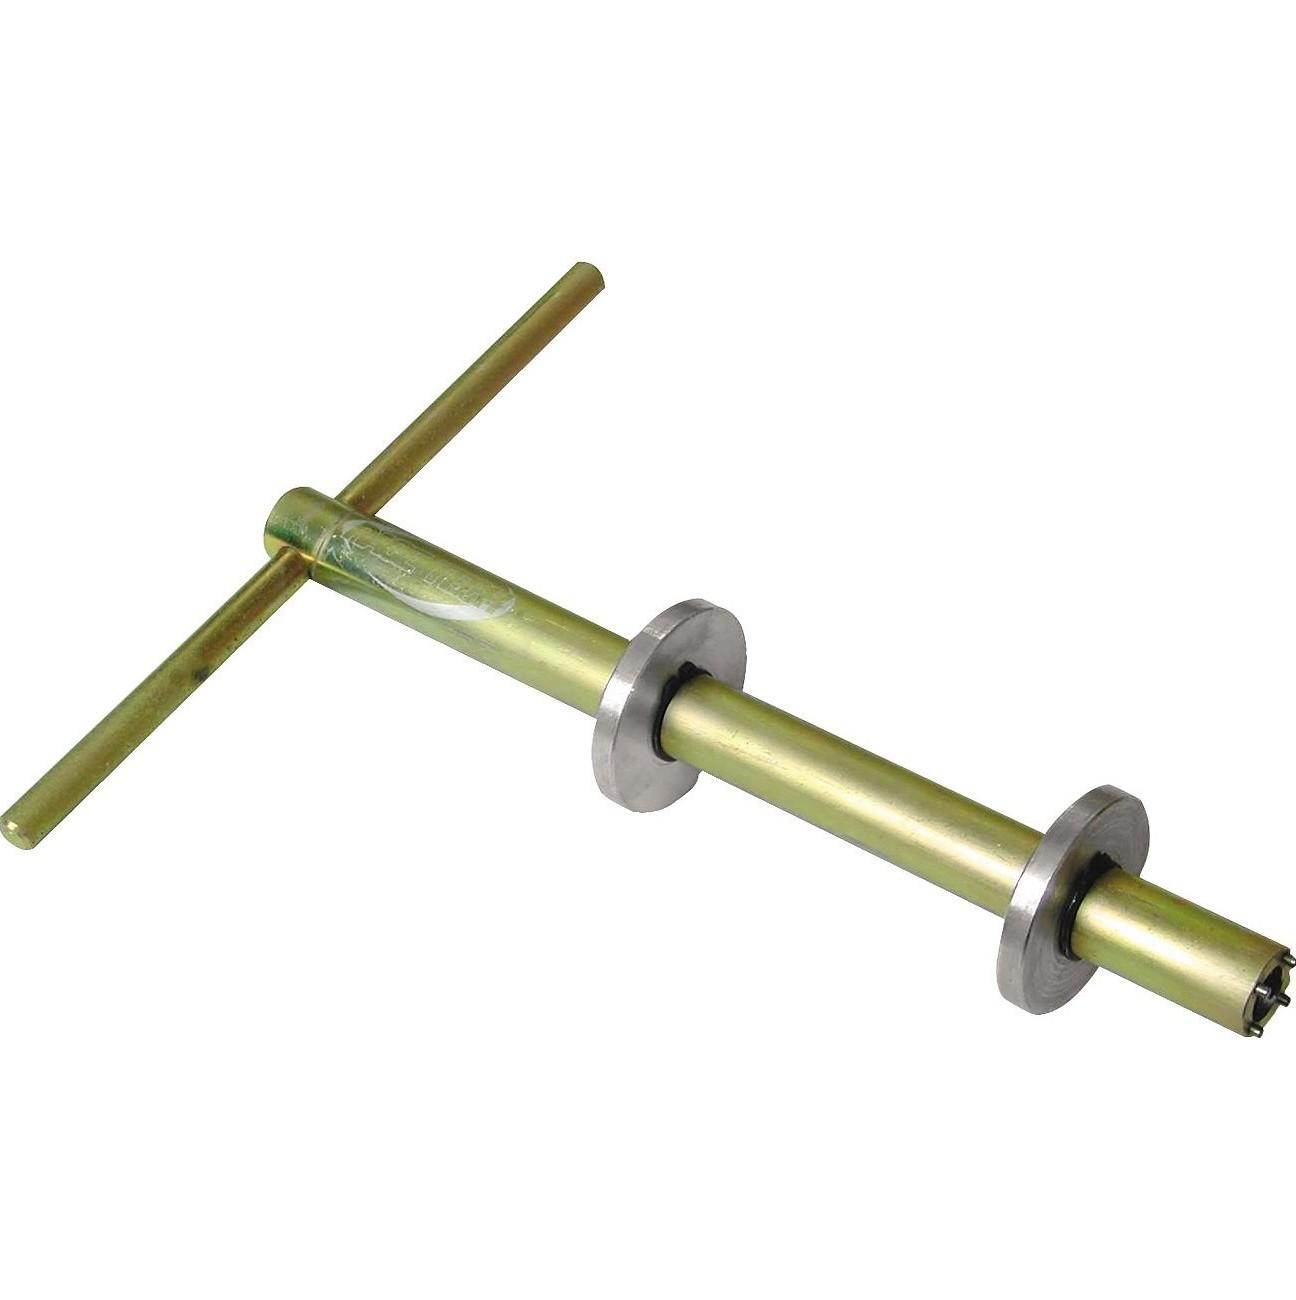 Race Tech T-Handle Shock Needle Tool  Race Tech T-Handle Shock Needle Tool